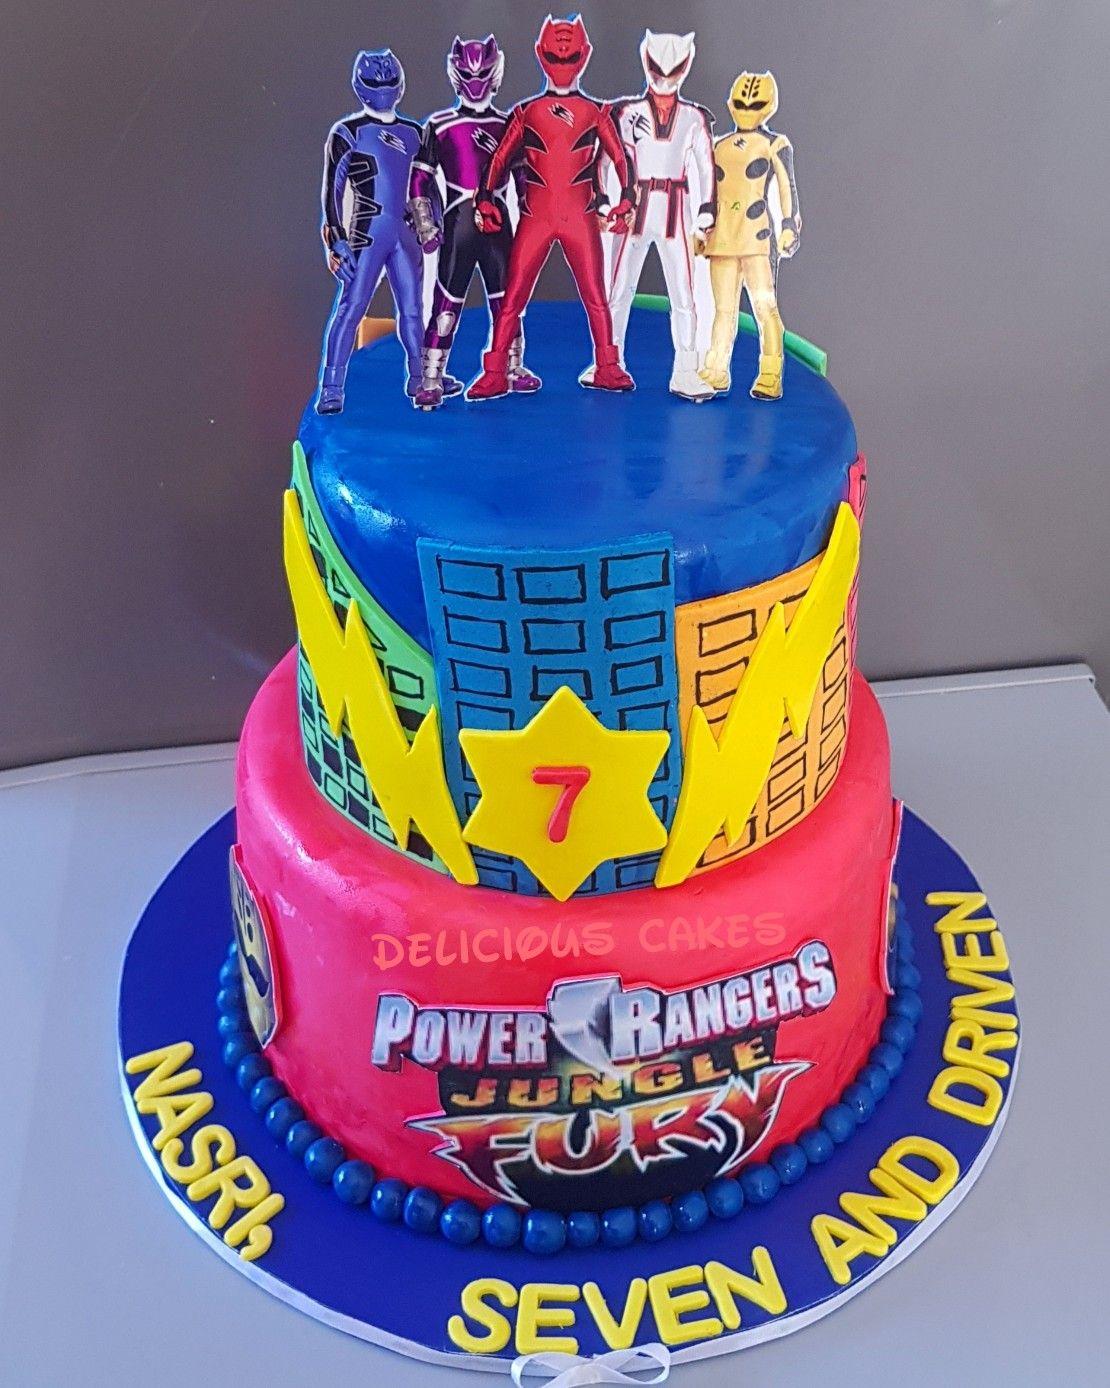 Power Rangers Jungle Fury Power Rangers Jungle Fury Yummy Cakes Power Rangers